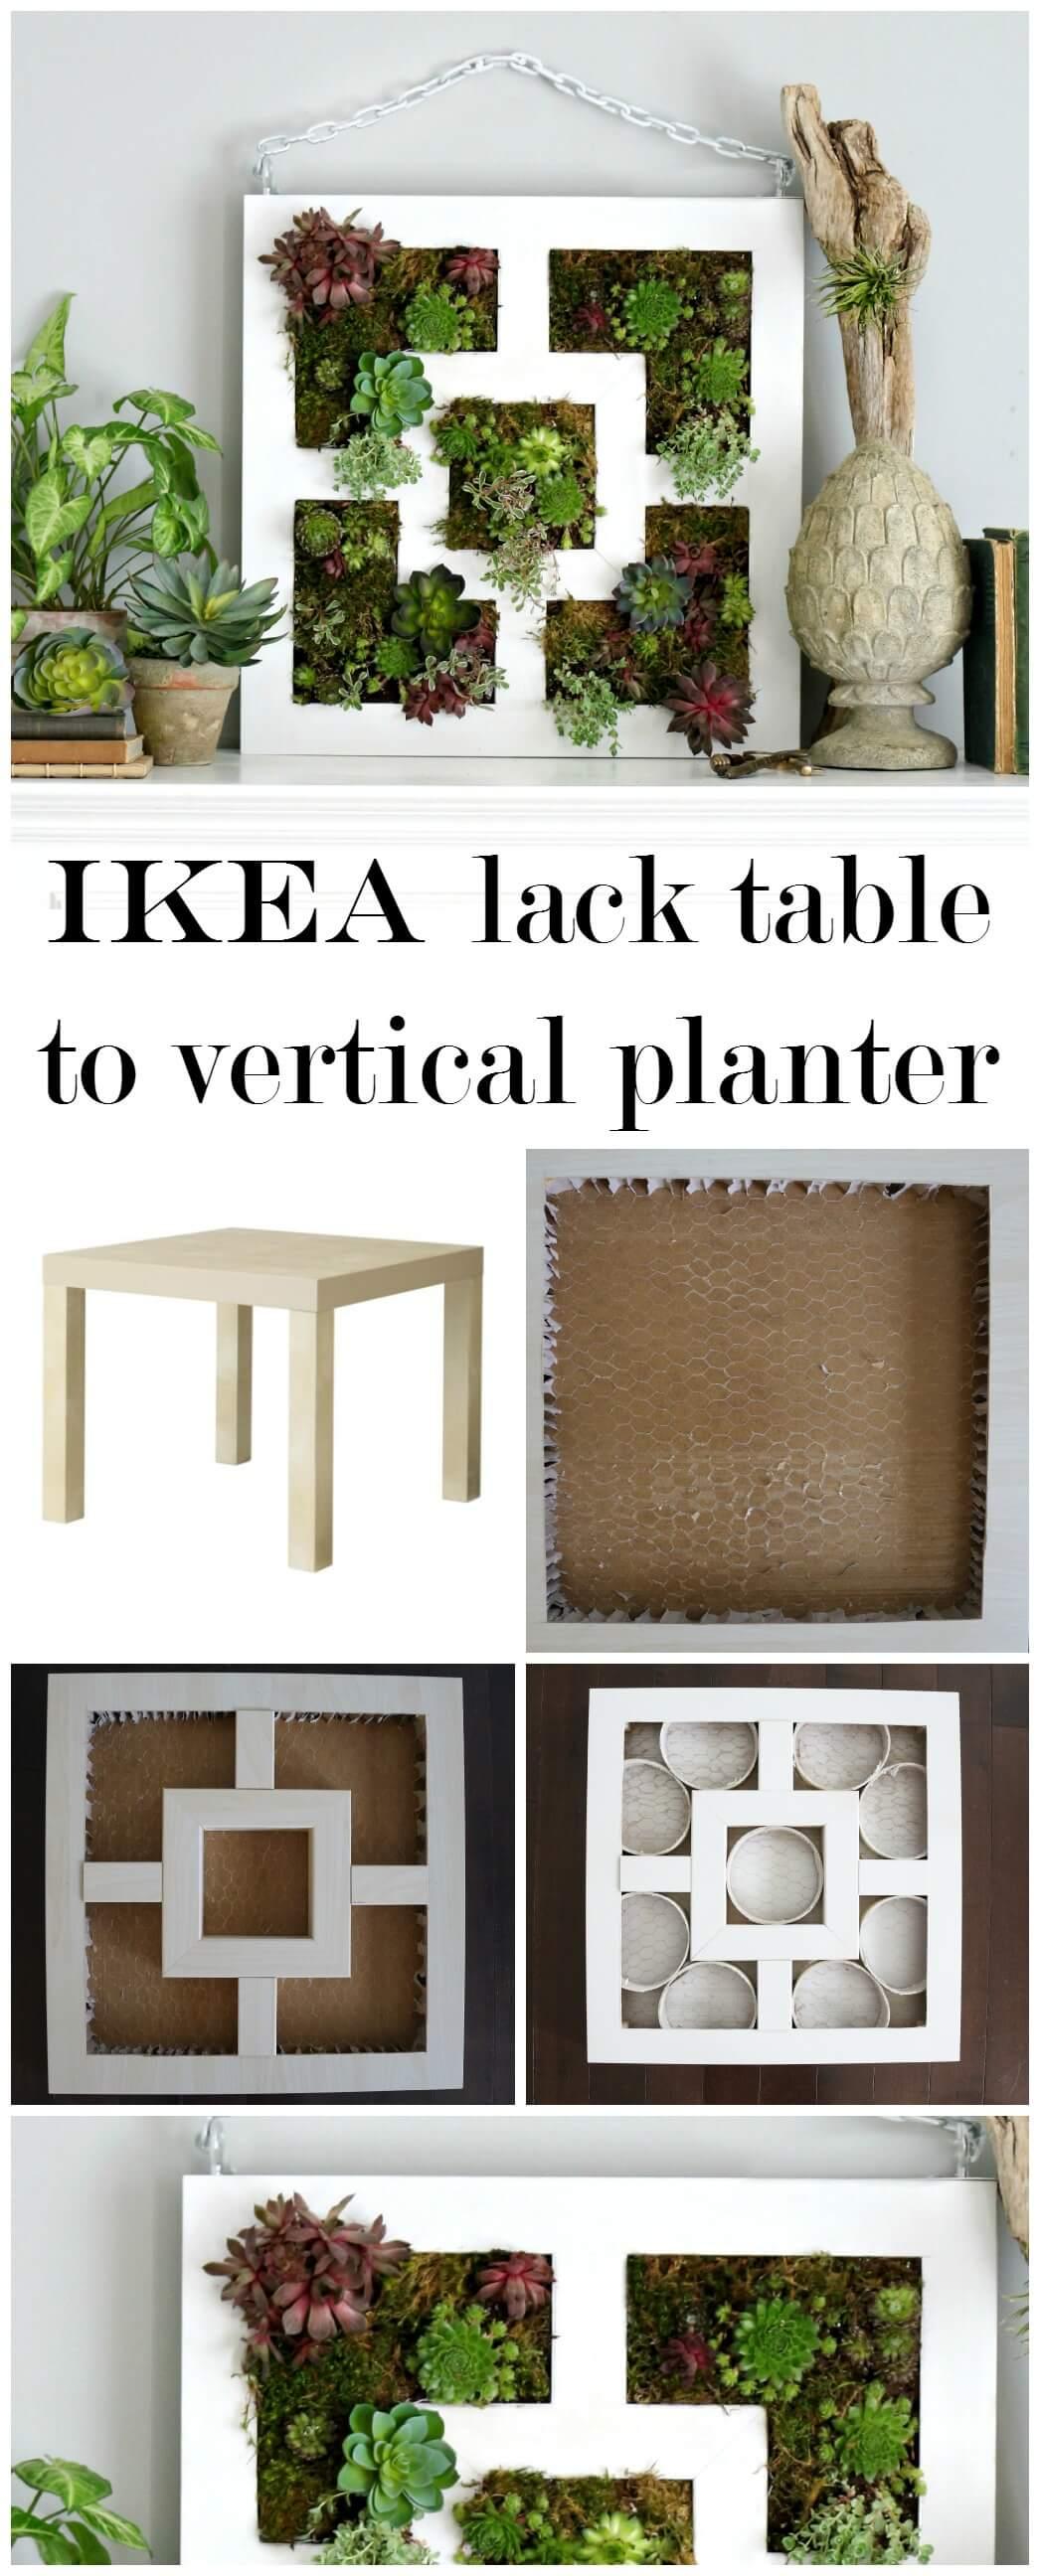 Repurpose a Table as a Vertical Planter